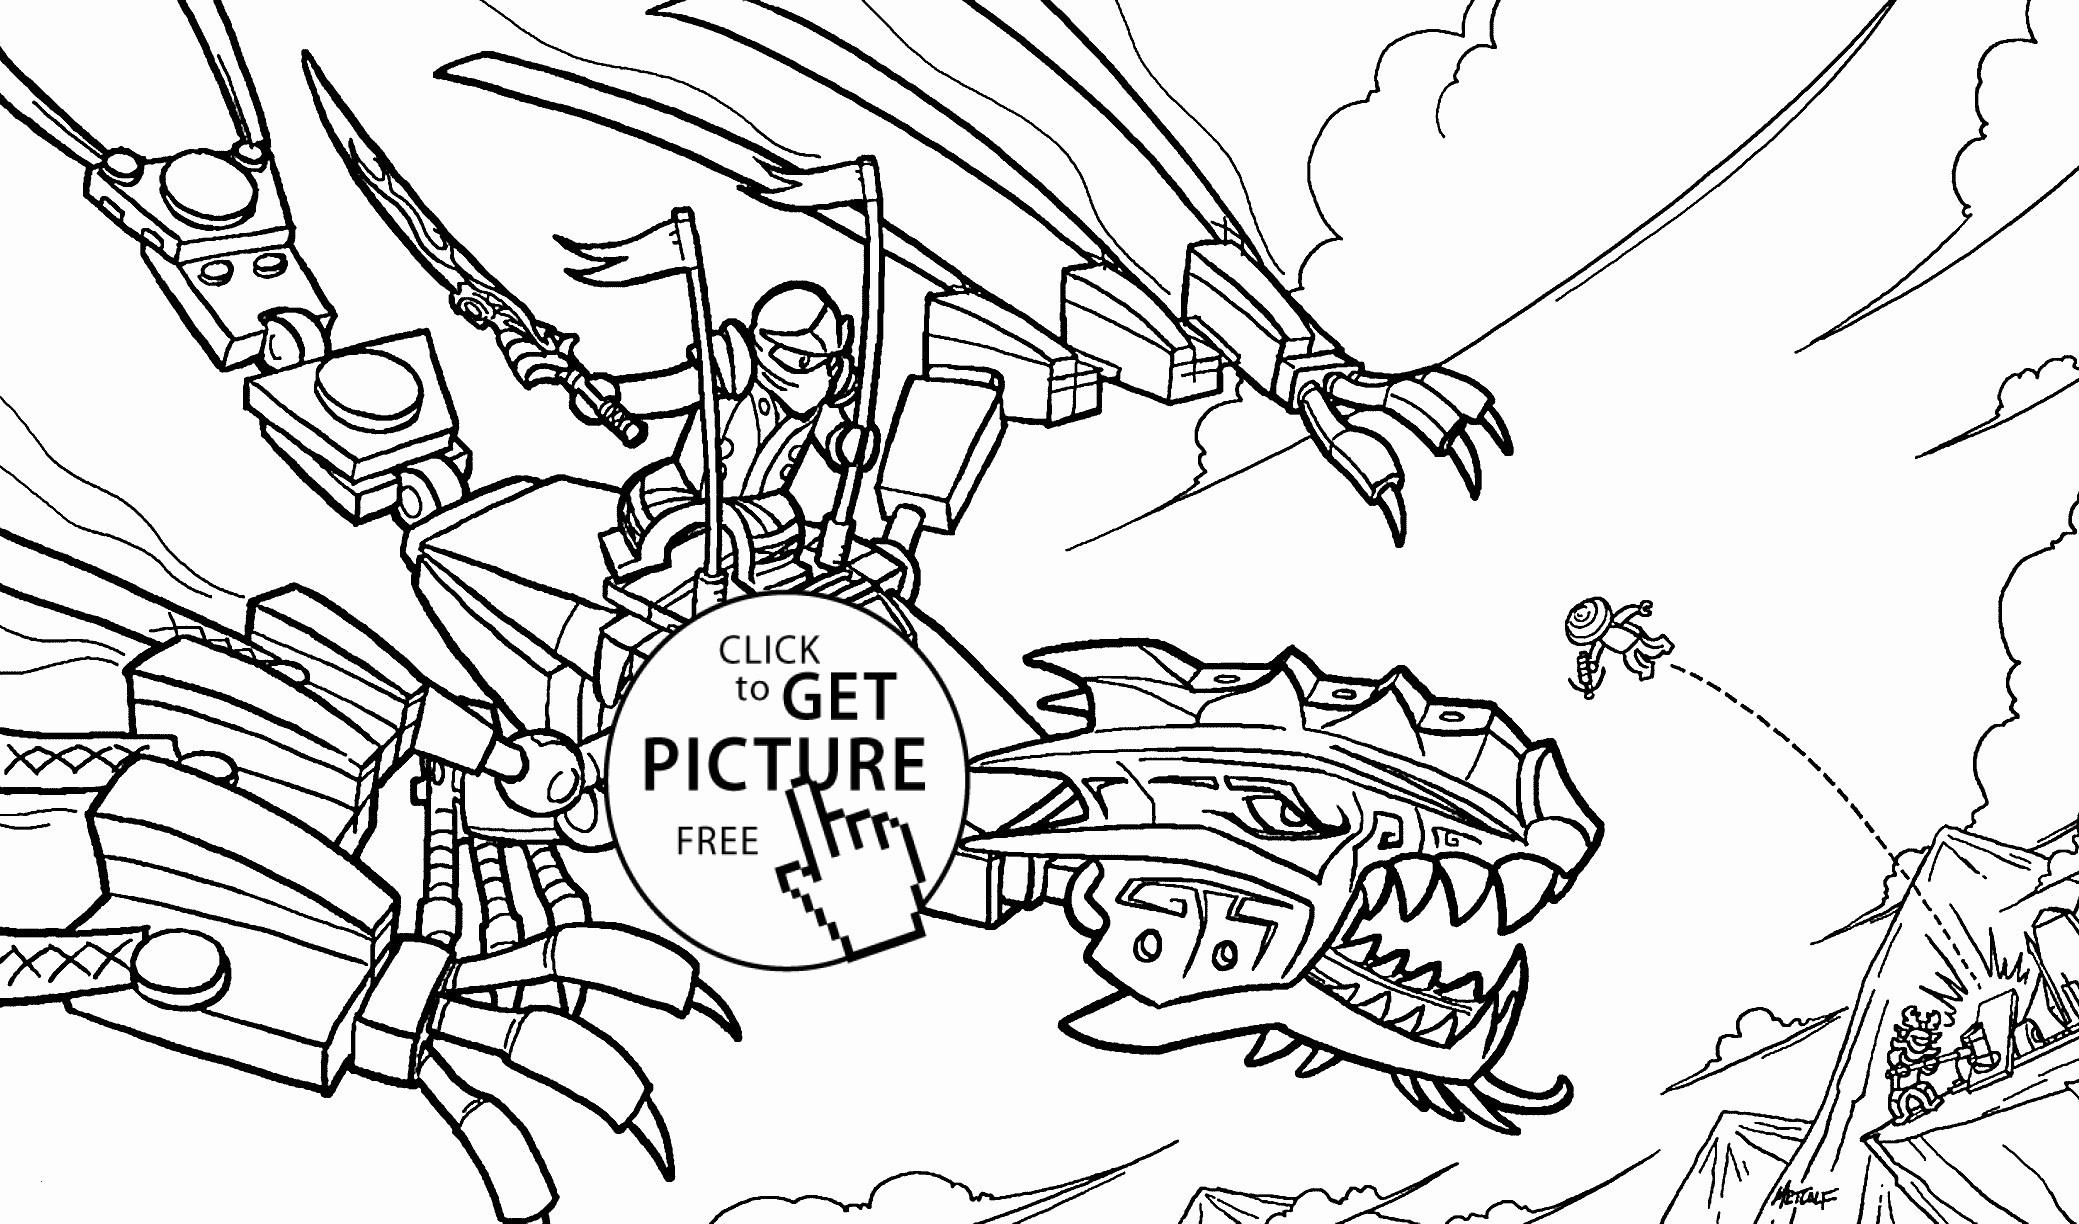 Ninjago Ausmalbilder Nya Das Beste Von 37 Ninjago Geister Ausmalbilder Scoredatscore Genial Ausmalbilder Das Bild